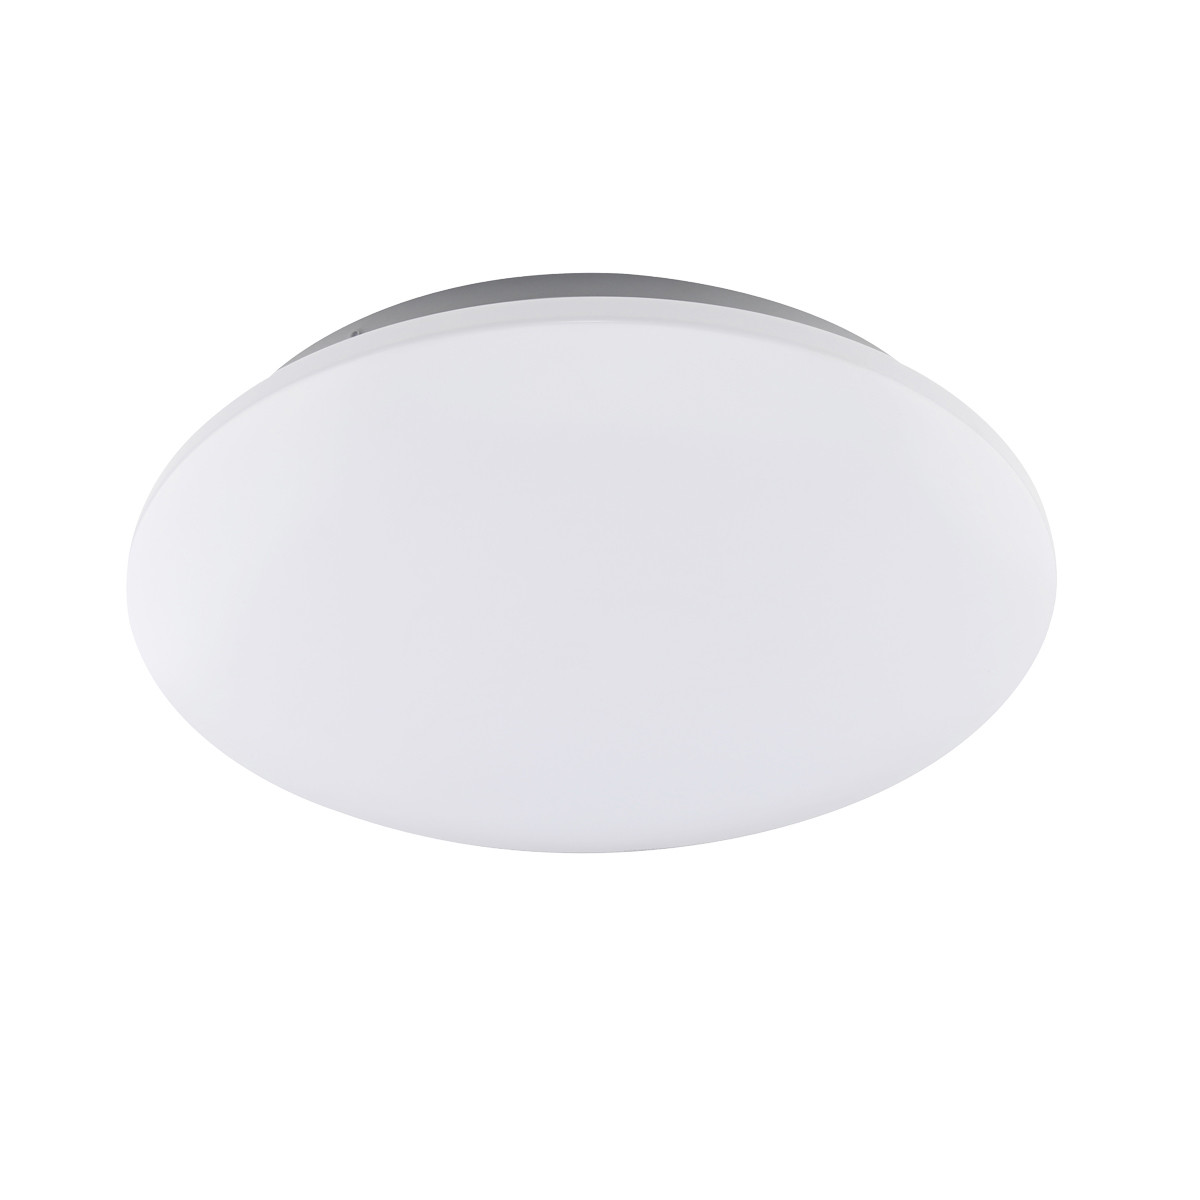 Zero II Flush 33cm Round 24W LED 5000K, 1700lm, White